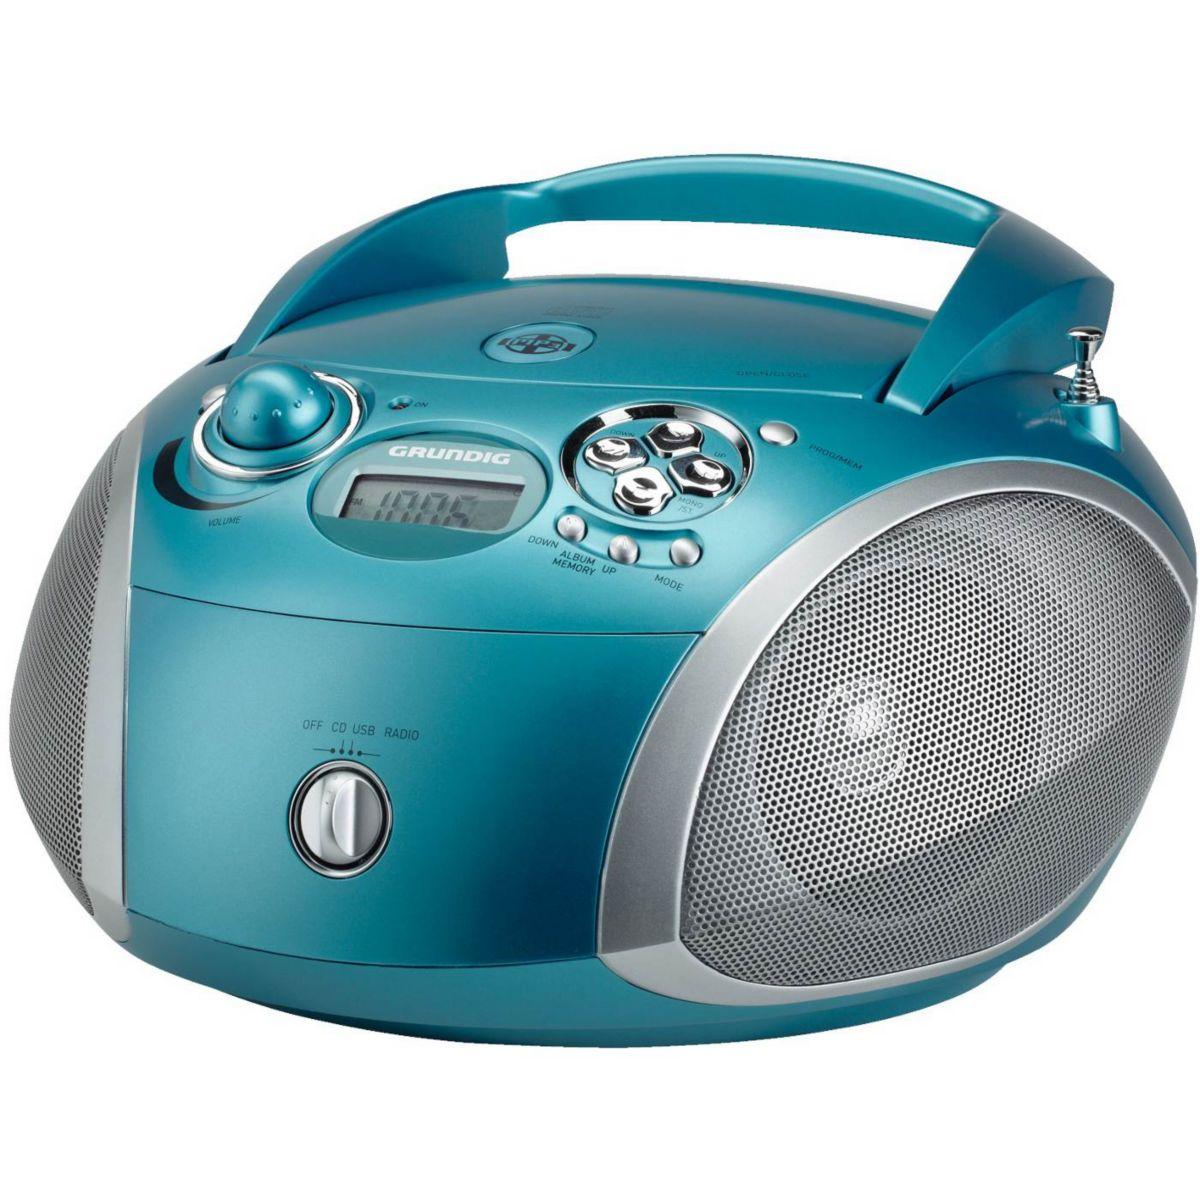 Radio cd grundig rcd1445 turquoise - livraison offerte : code ...